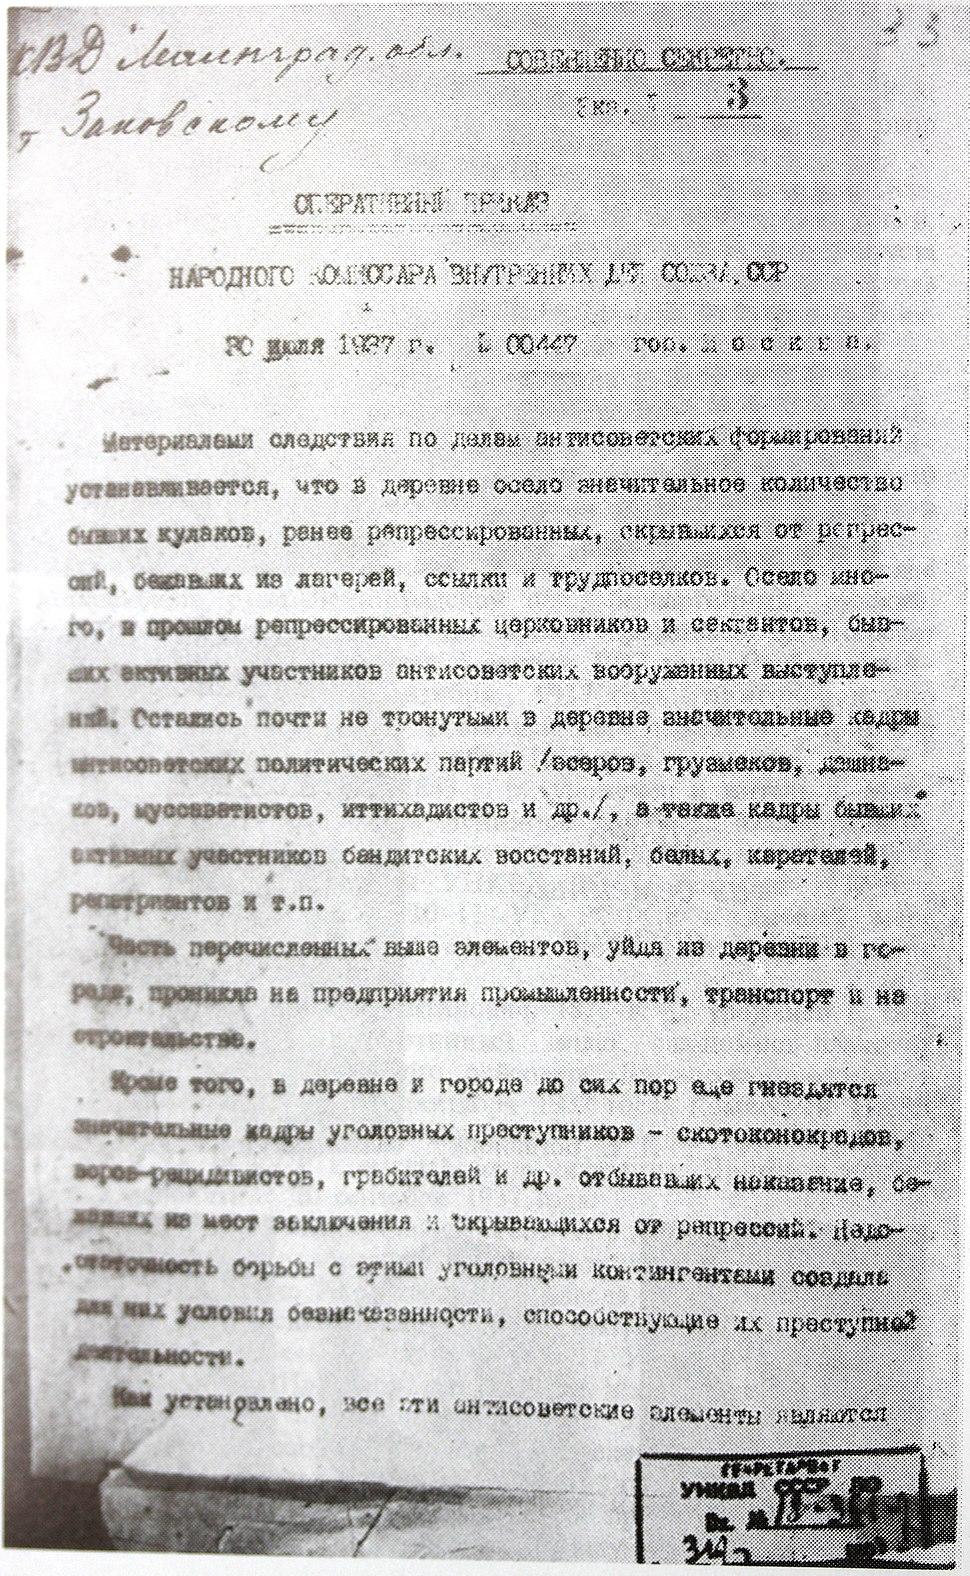 NKVD Order No. 00447